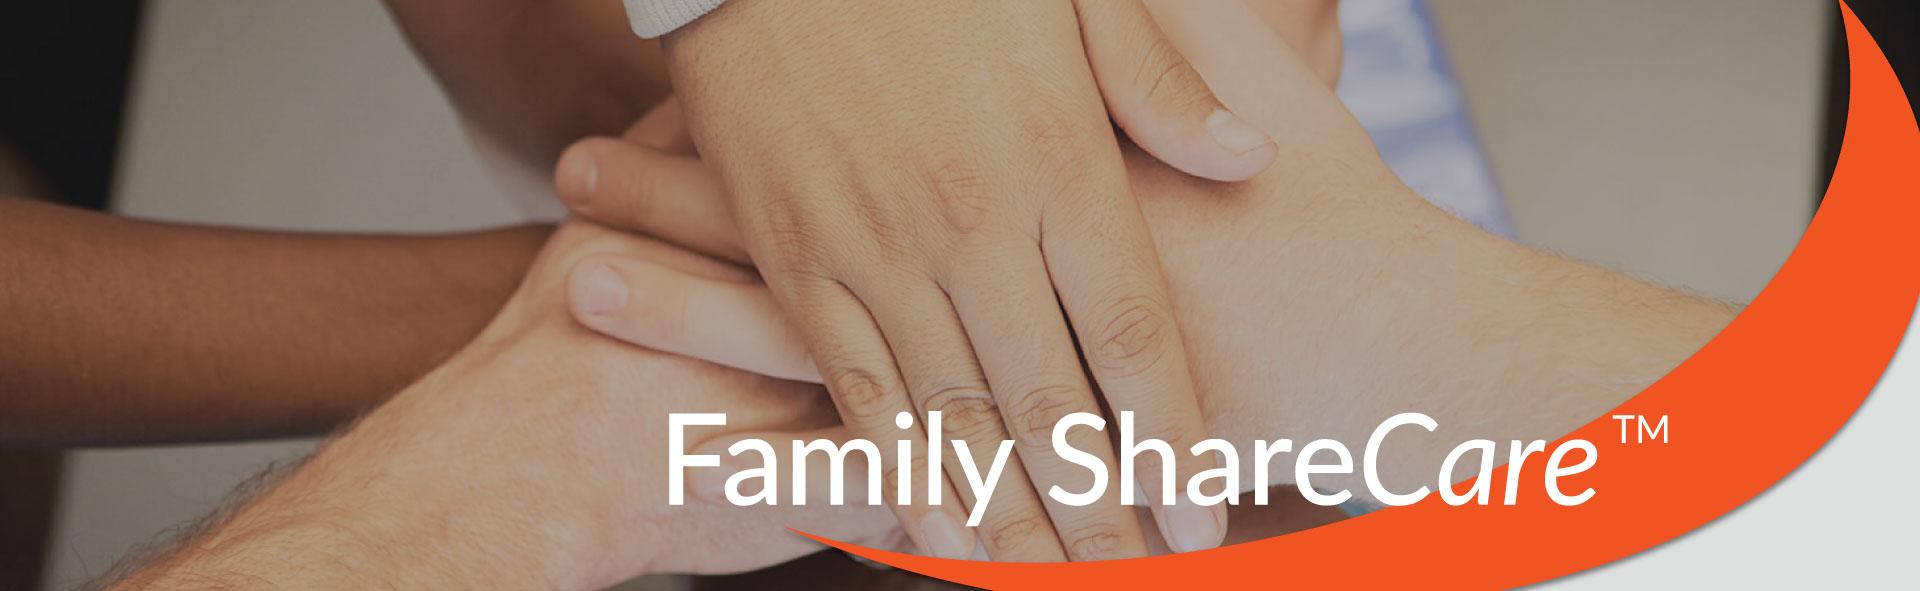 Family ShareCare